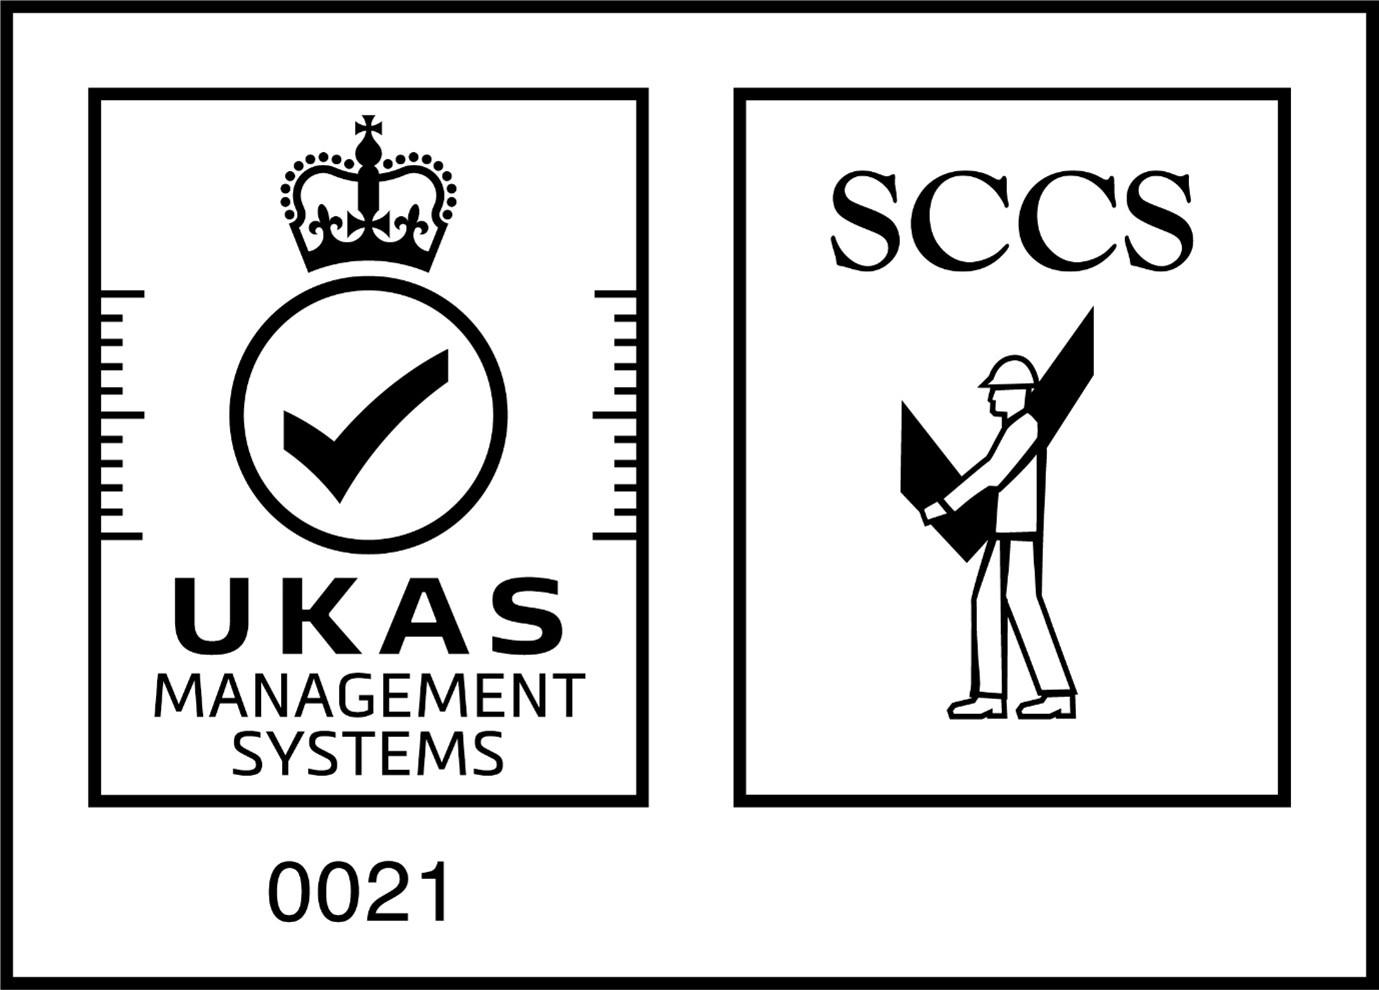 SCCS UKAS logo